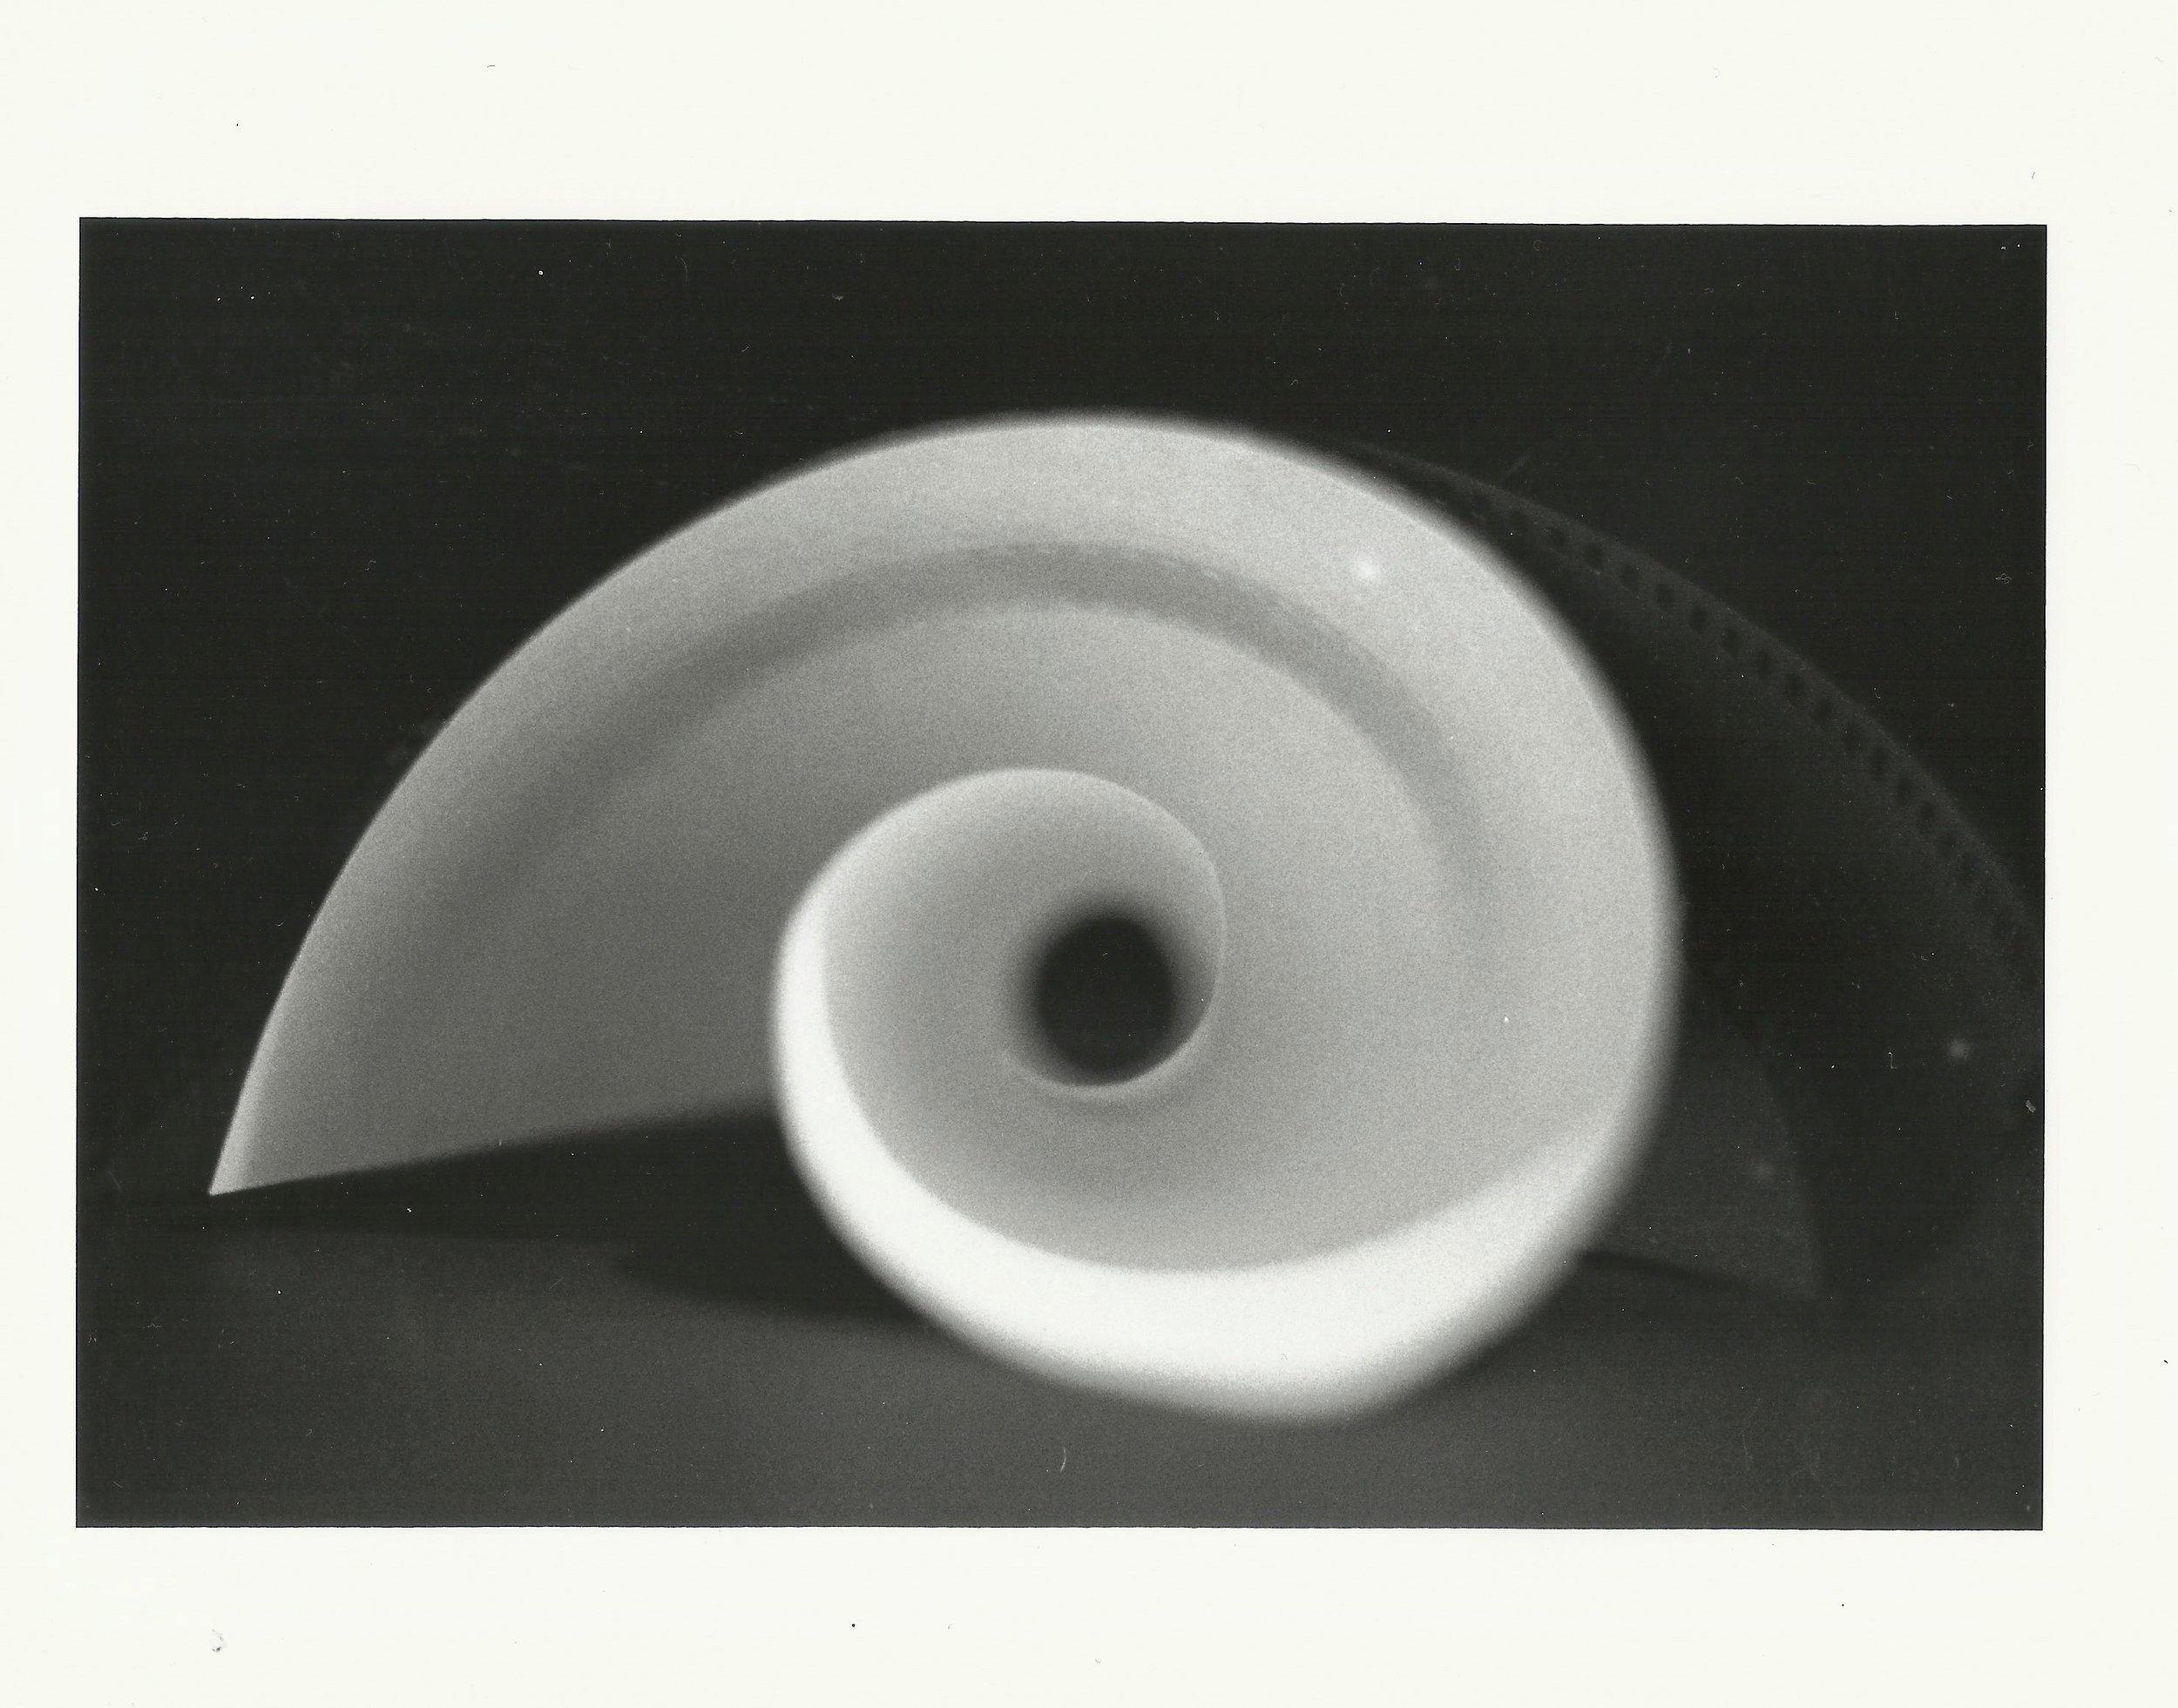 SCAN0021.jpg